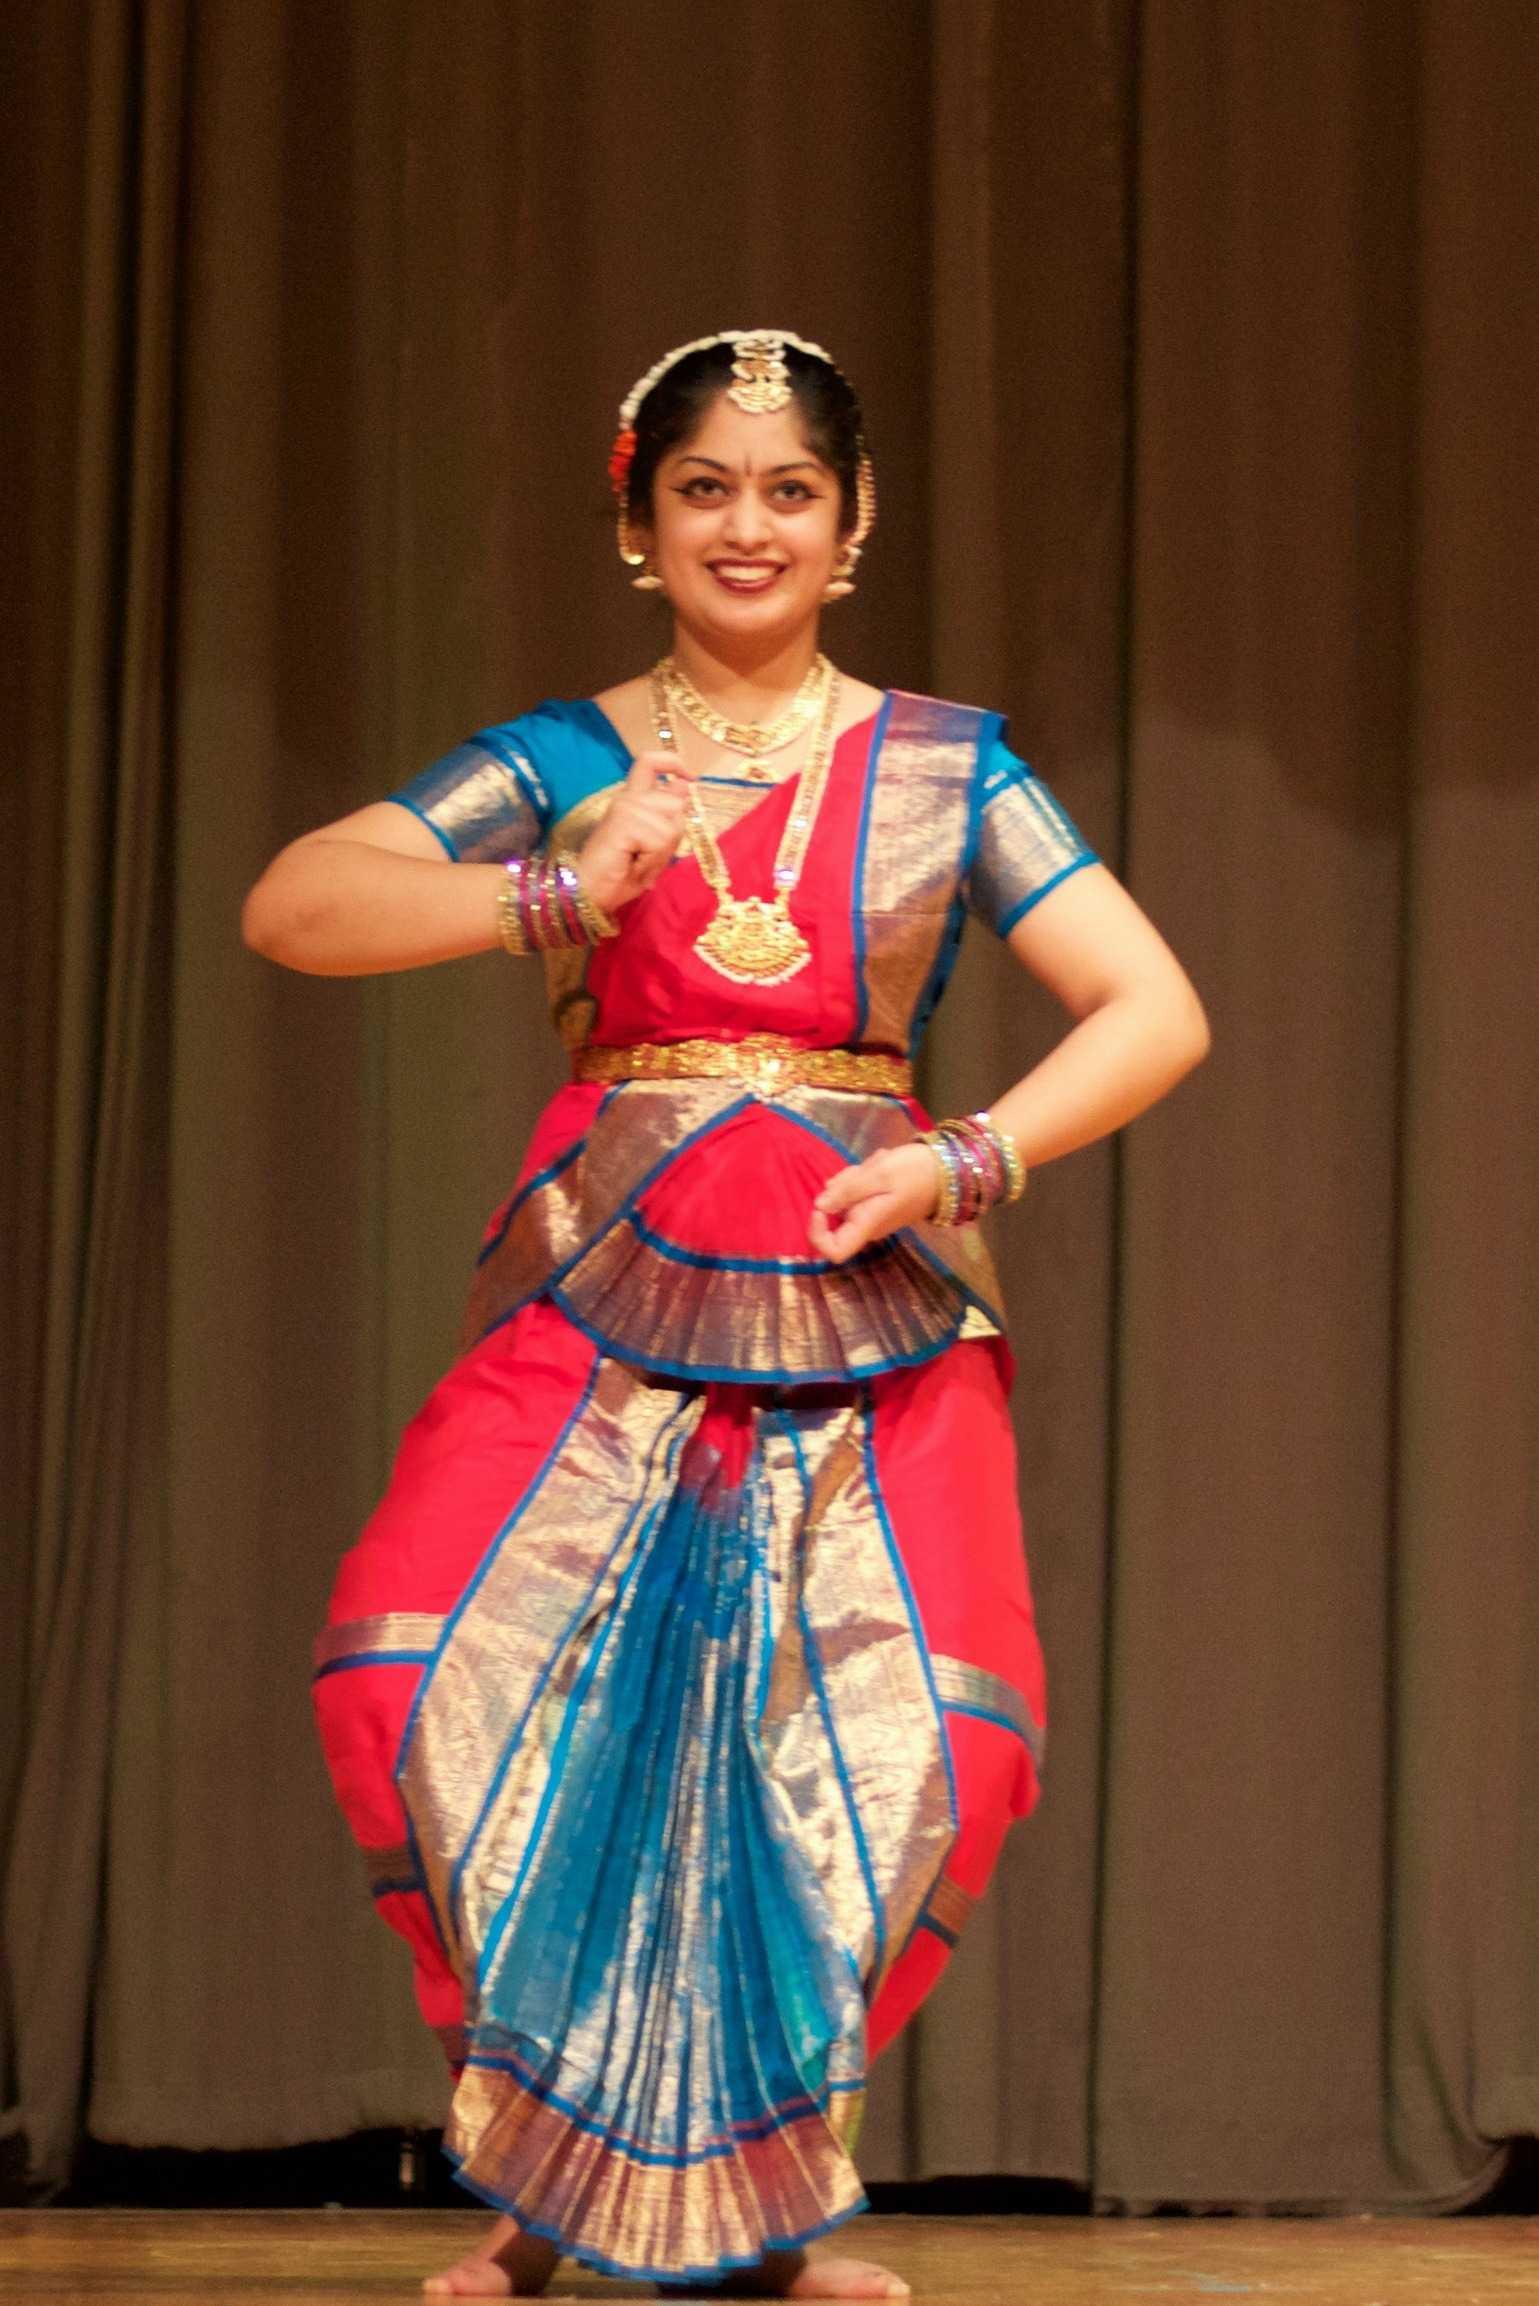 Niharika Tayade (11) dancing Bharatanatyam, an Indian classical dance.